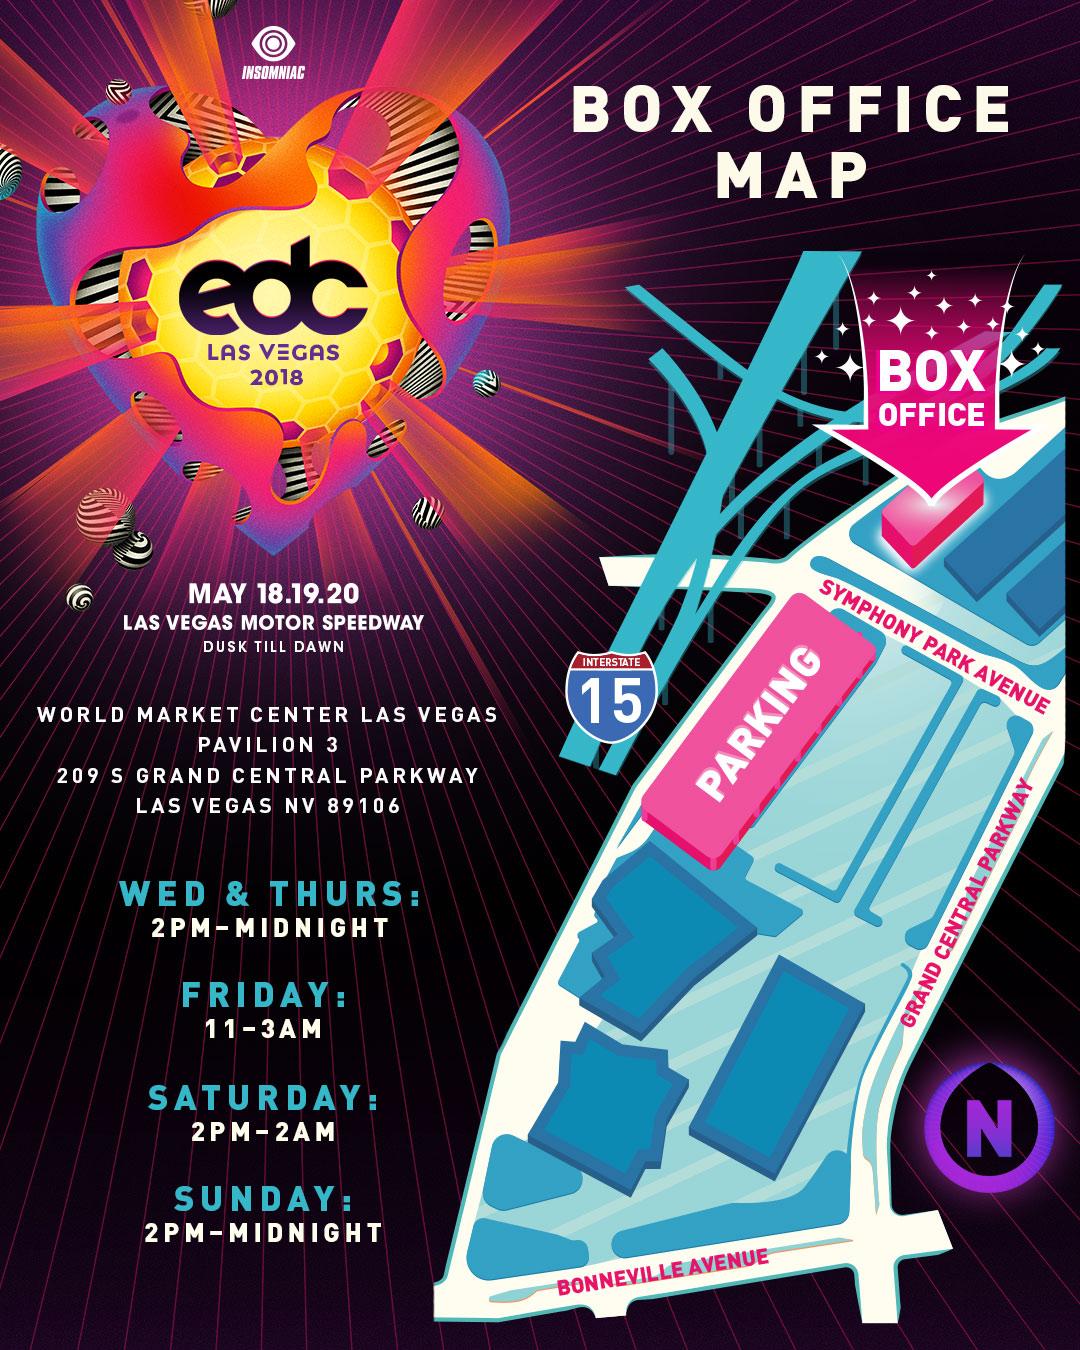 EDC Las Vegas box office map